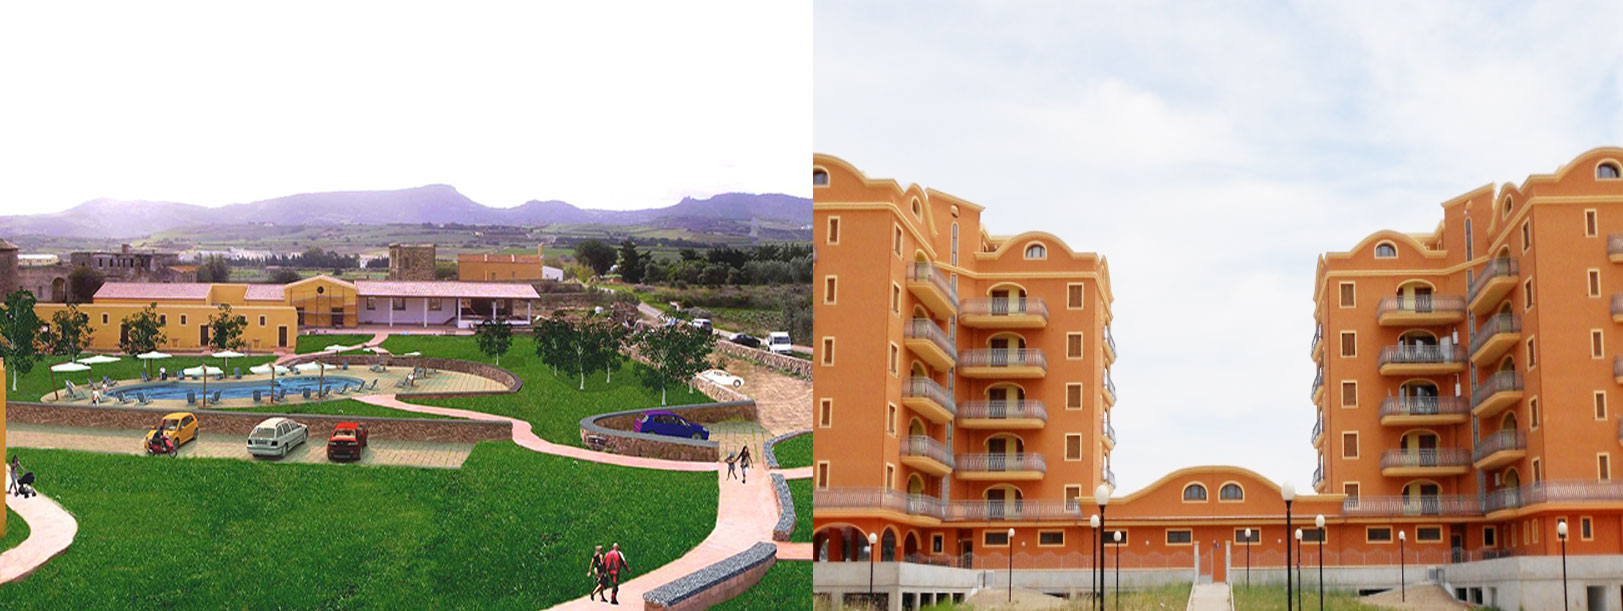 Vendita appartamenti Sassari